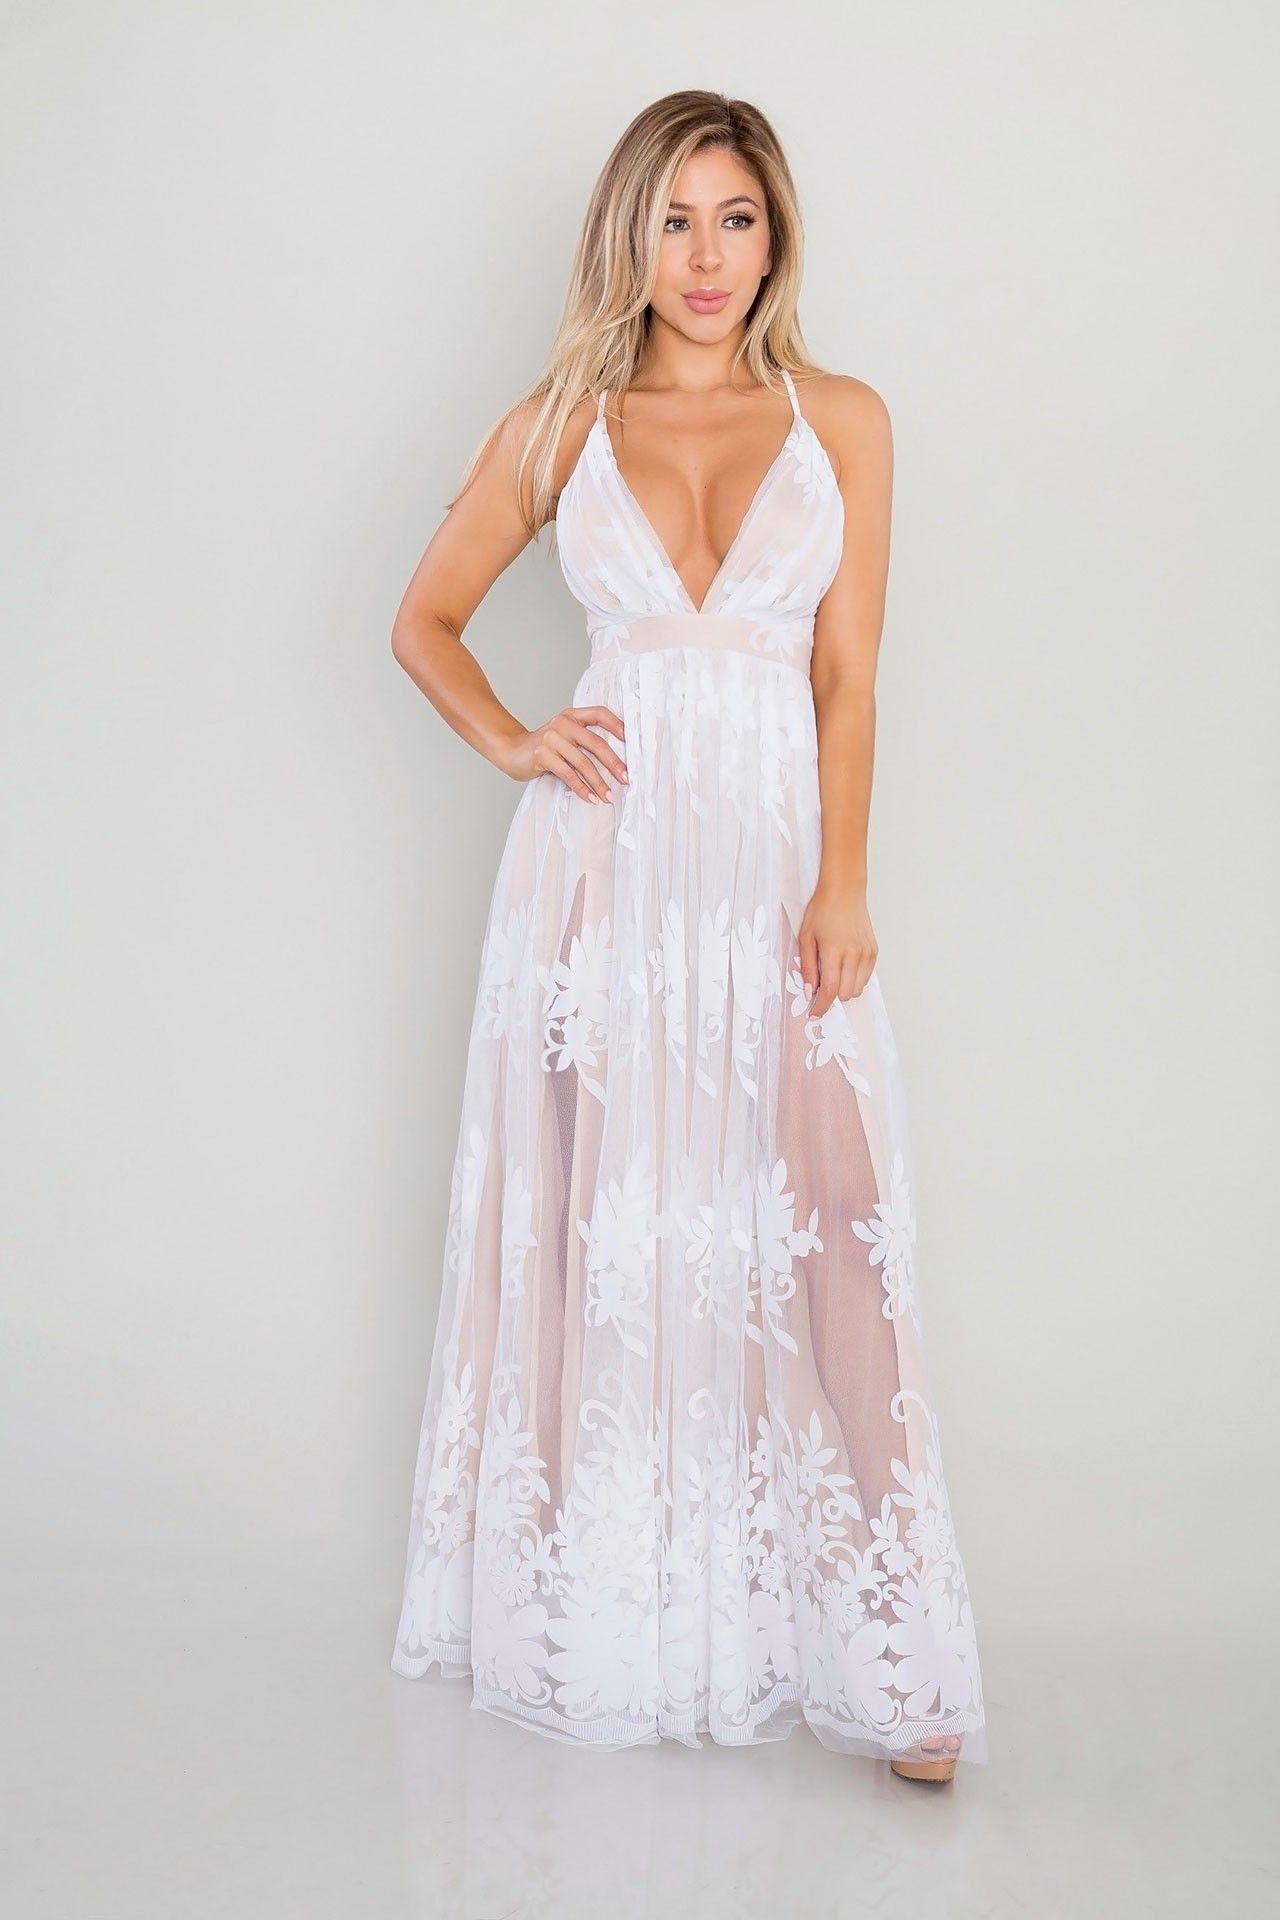 9dddfc9cbe3b2 Floral Mesh Maxi Dress - White | Nedi Nazari | Bridesmaid dresses ...